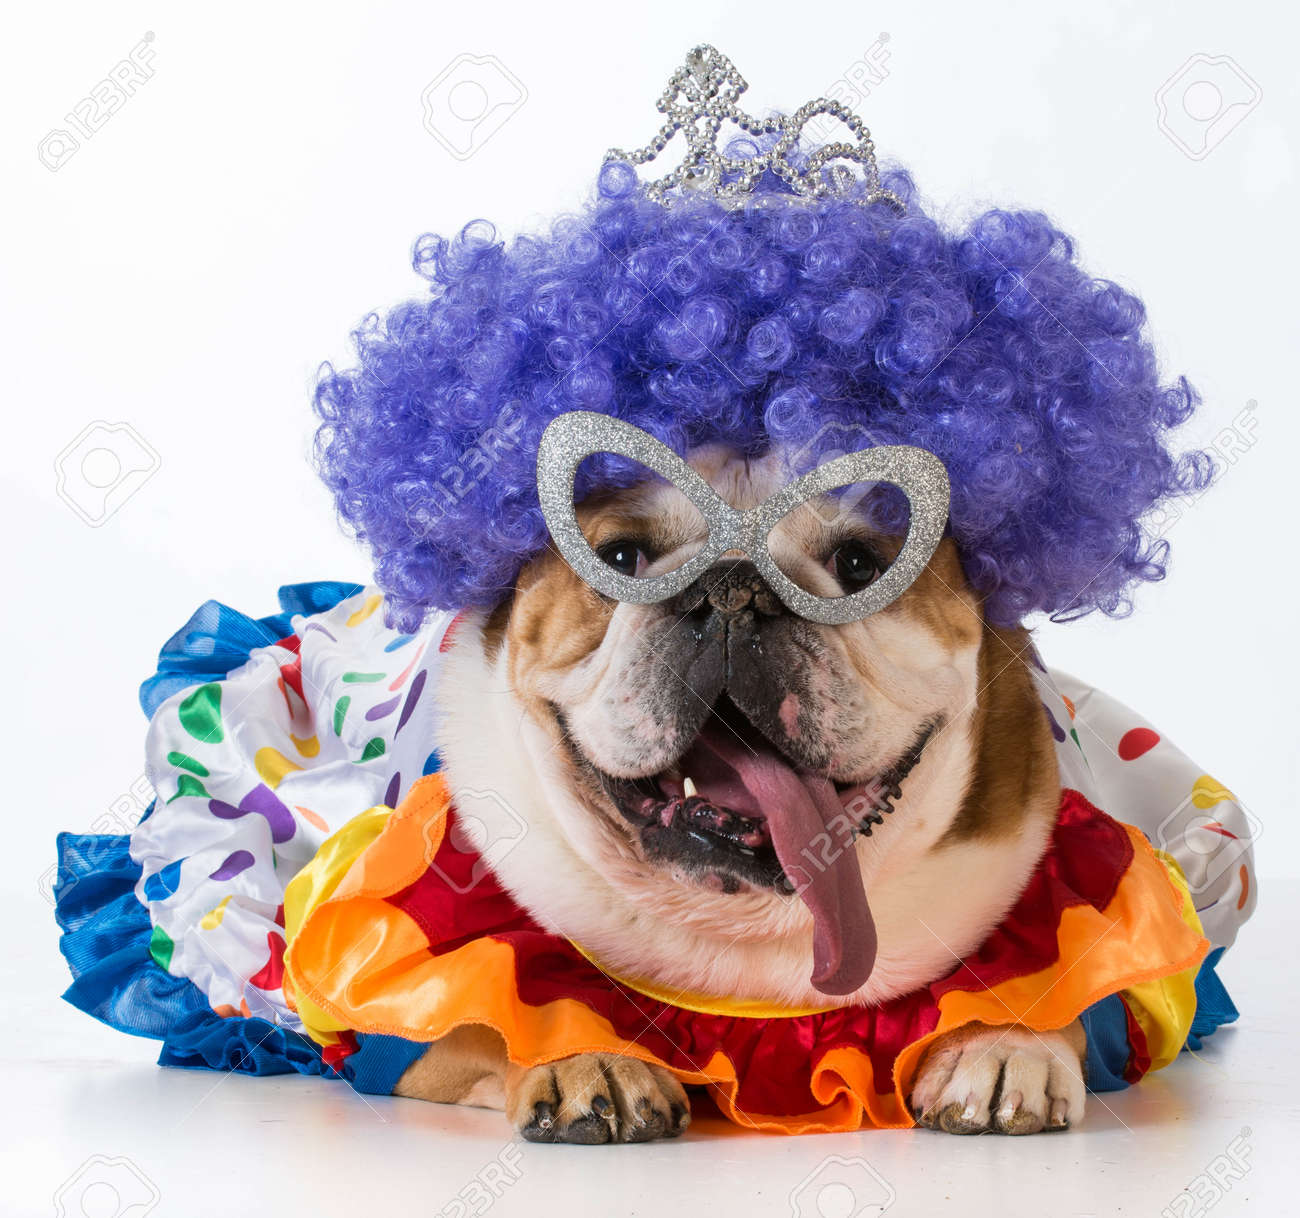 funny dog - english bulldog dressed up like a clown on white background - 37177140